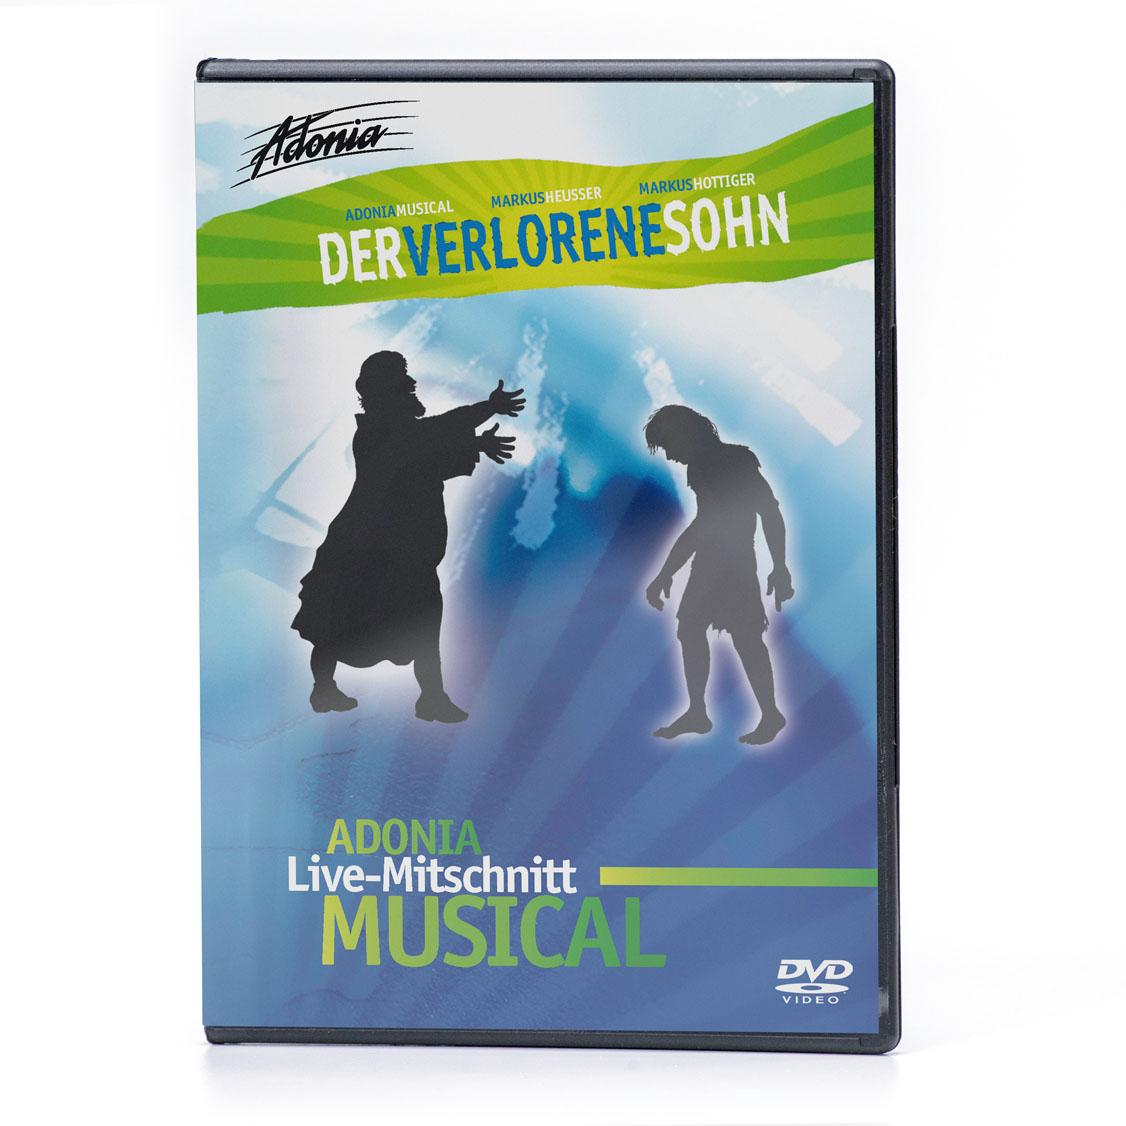 Live-Film - Der verlorene Sohn